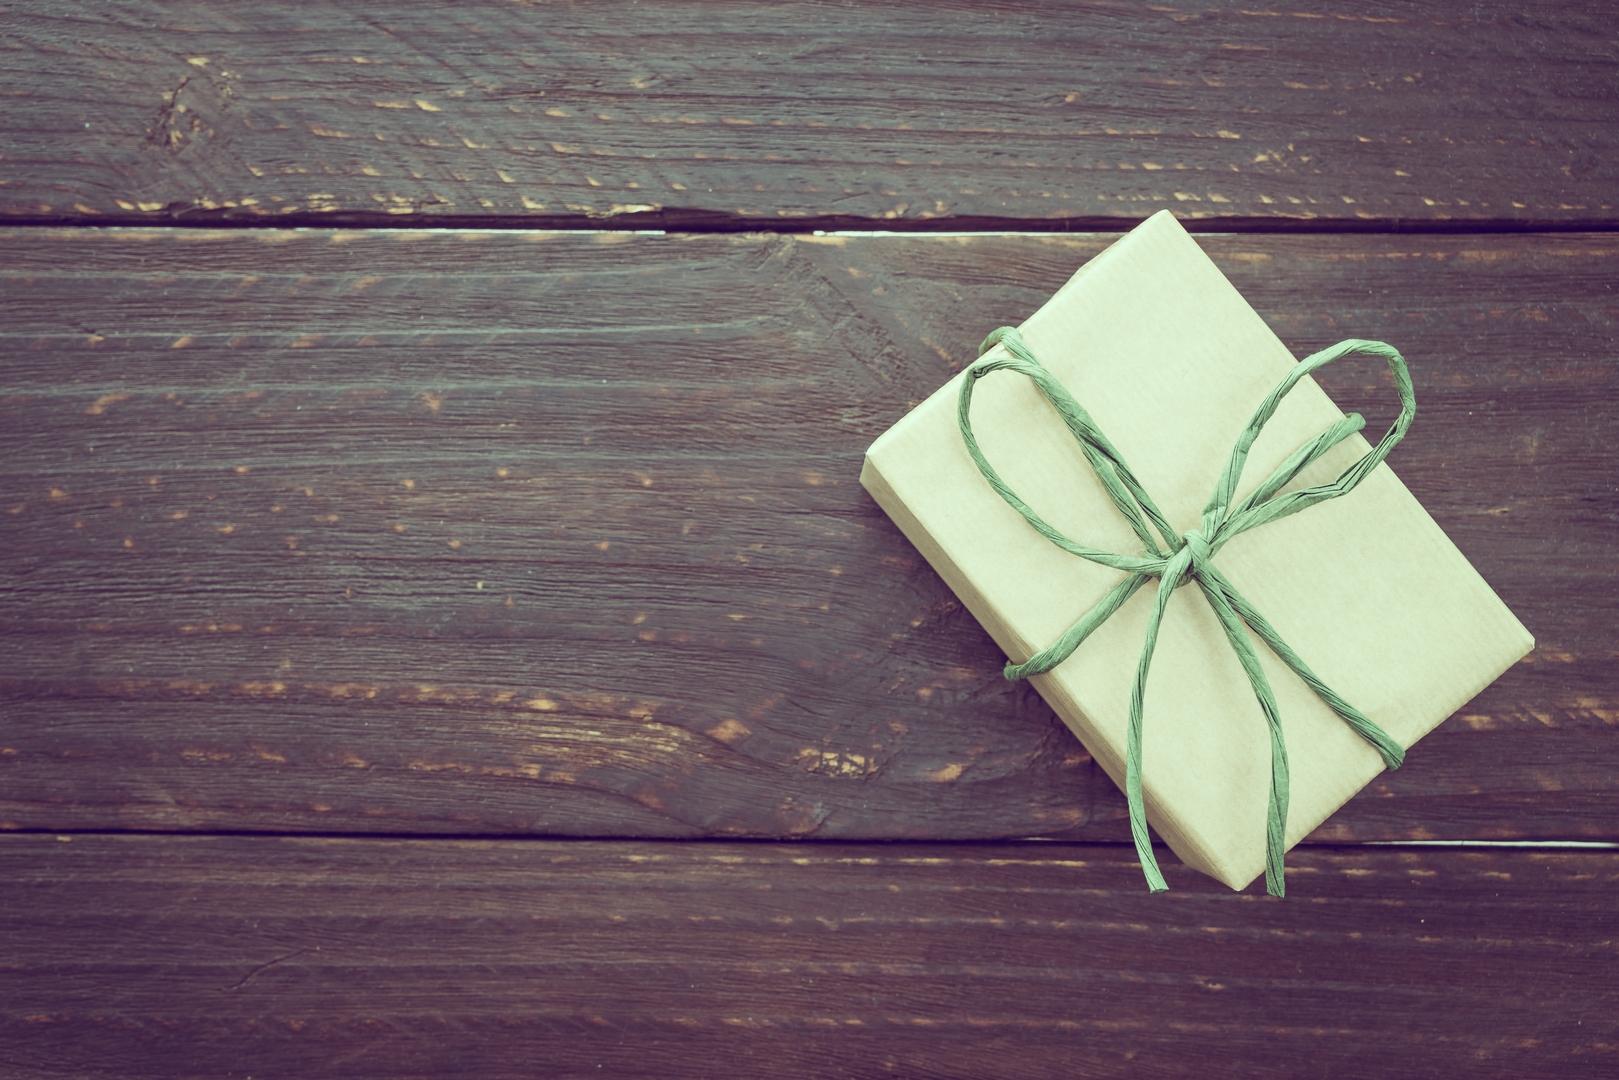 Oferta sklepu z prezentami